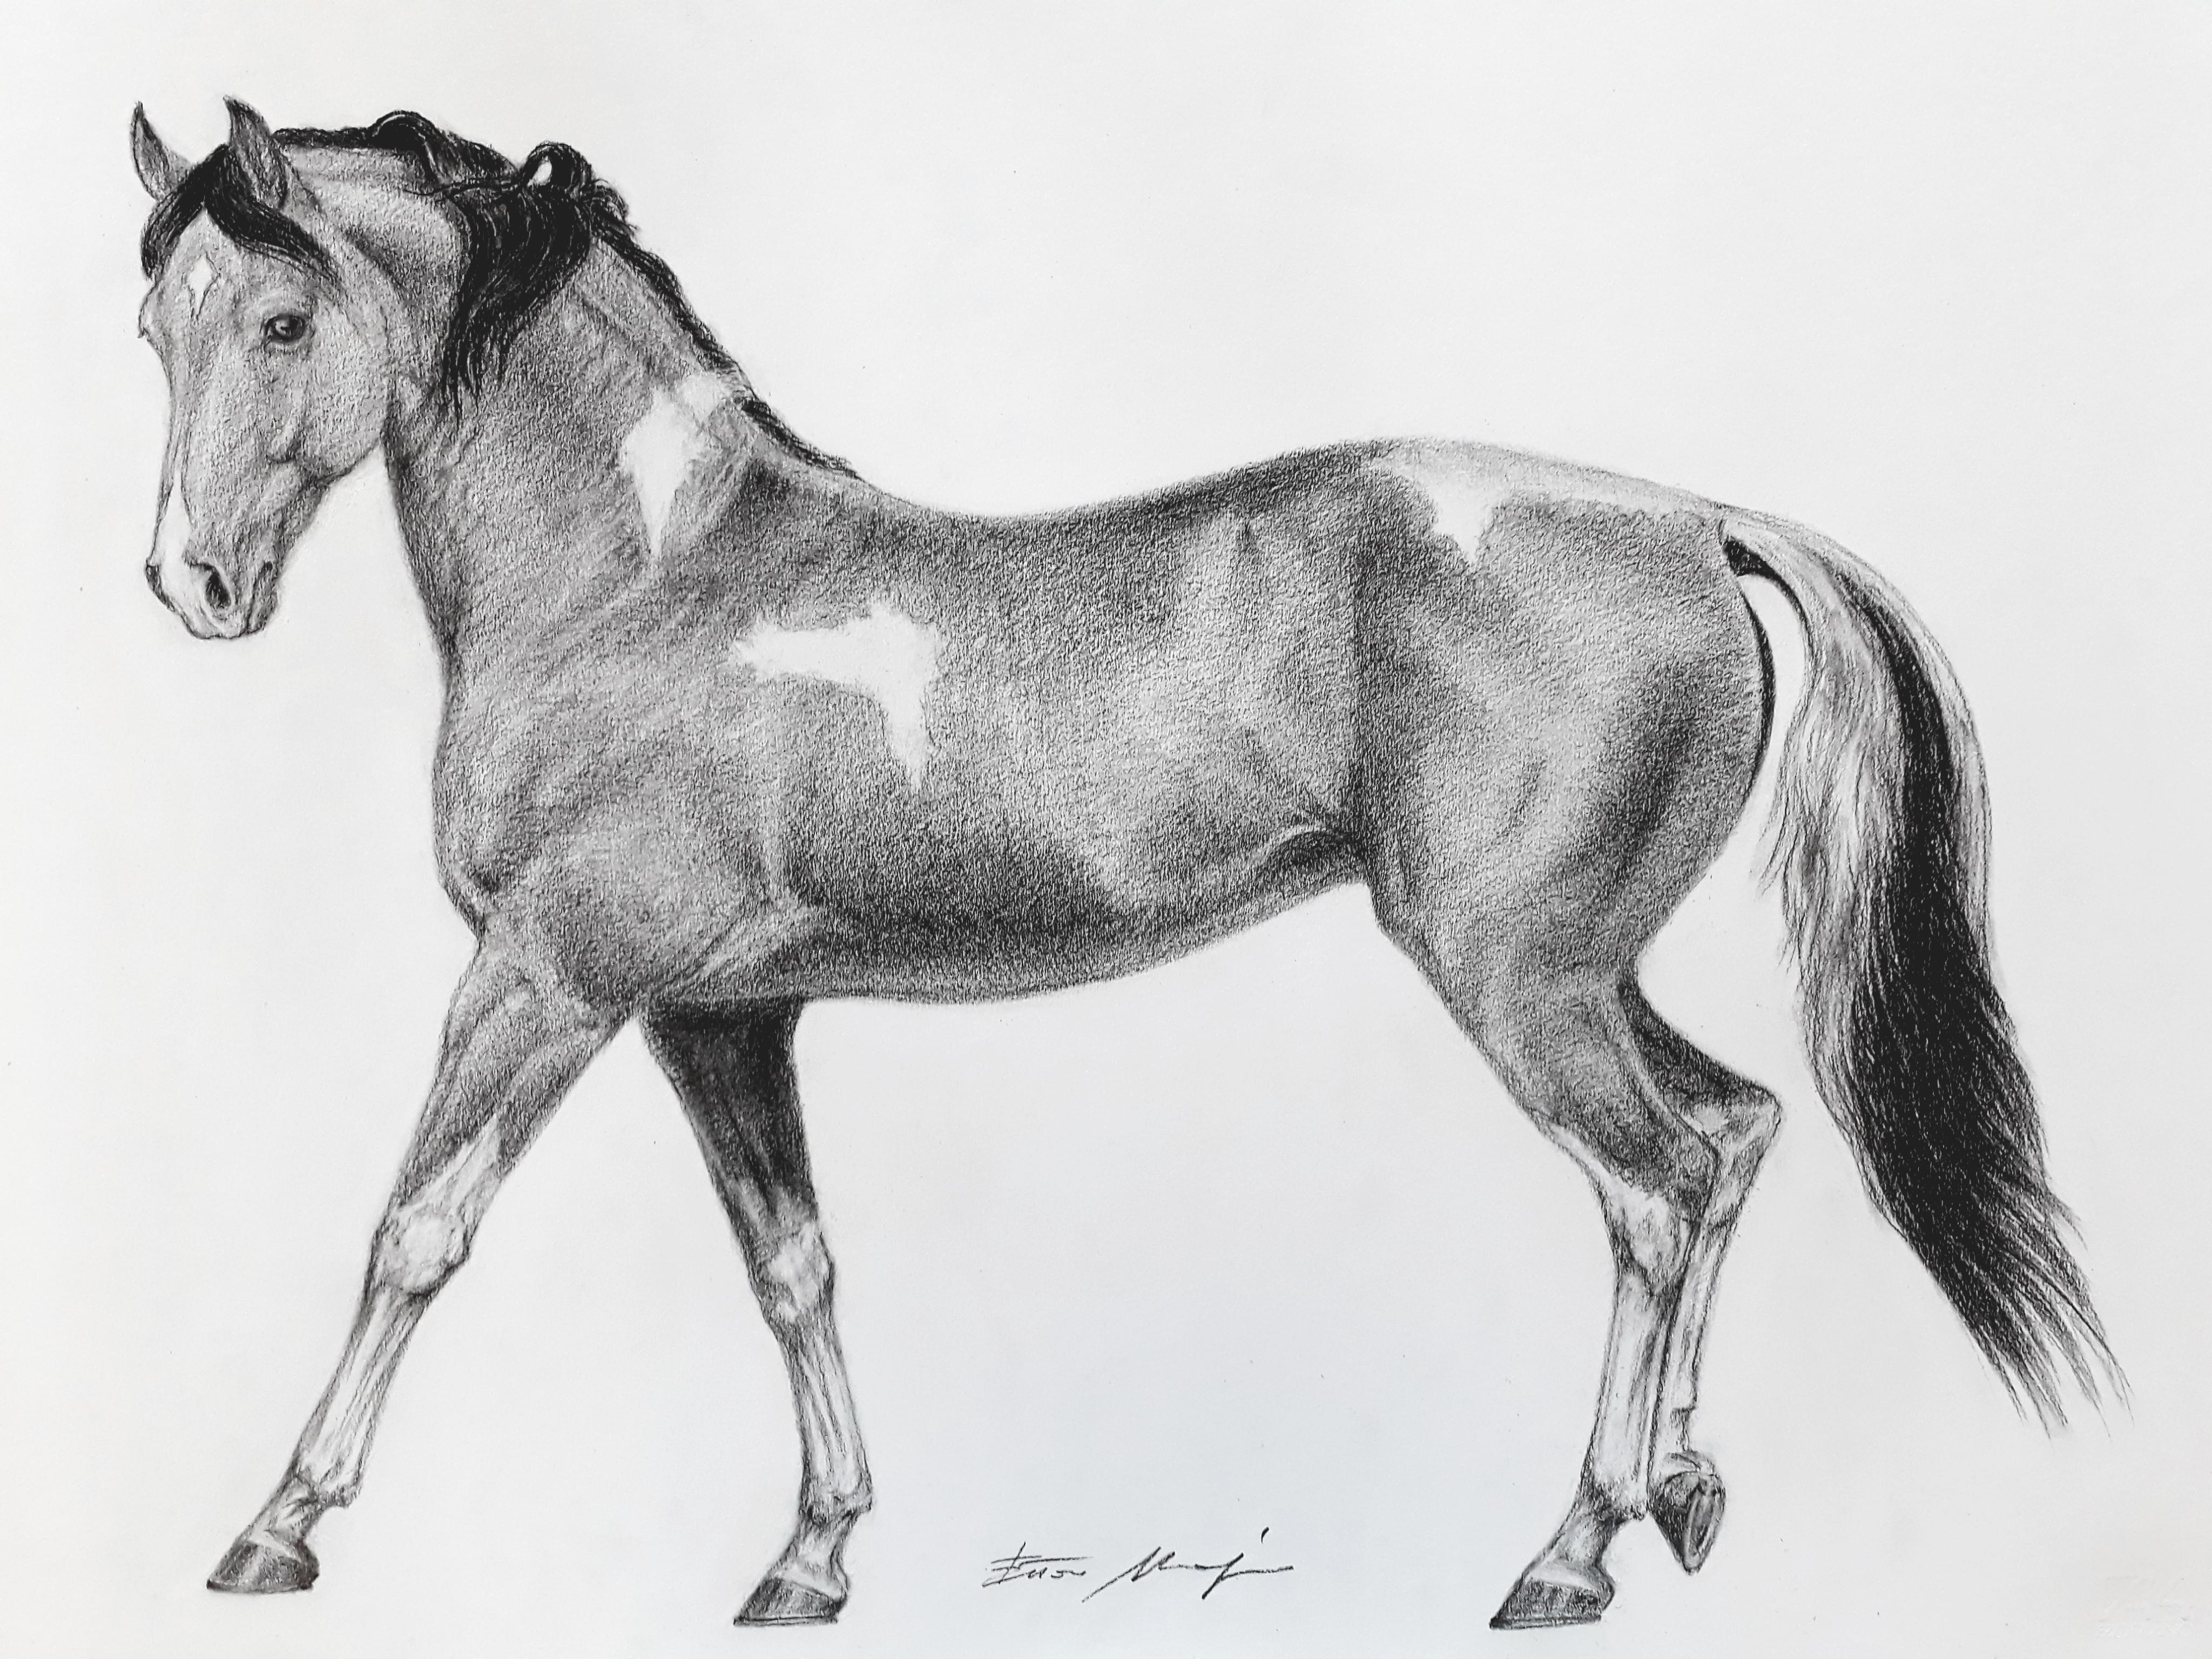 THE HORSE PIPPI